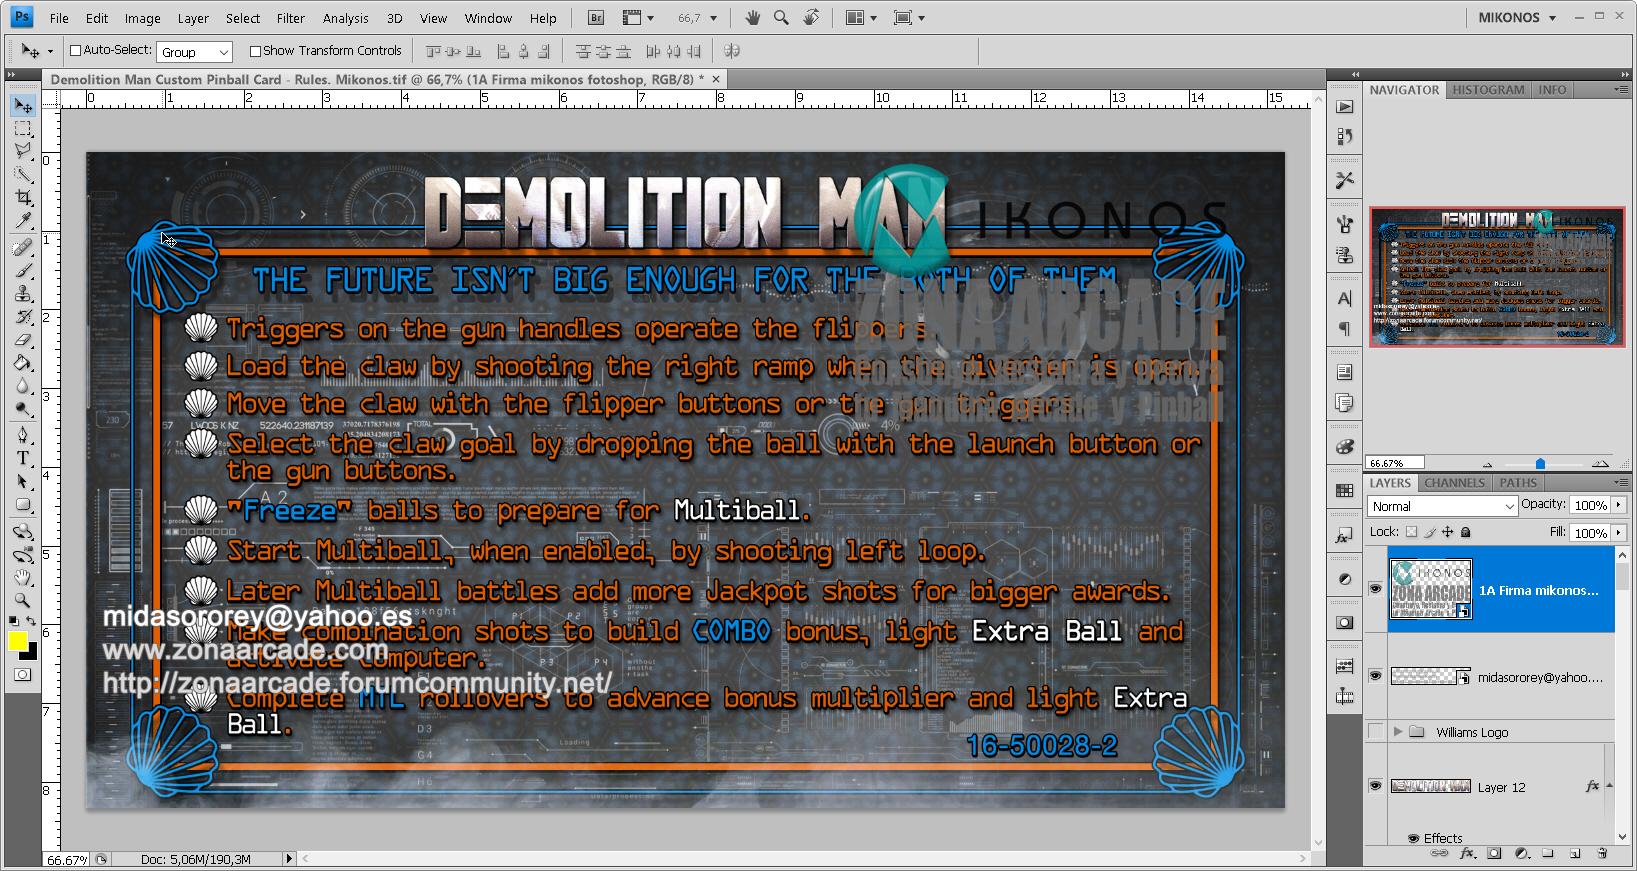 Demolition%20Man%20Pinball%20Card%20Customized%20-%20Rules.%20Mikonos1.jpg